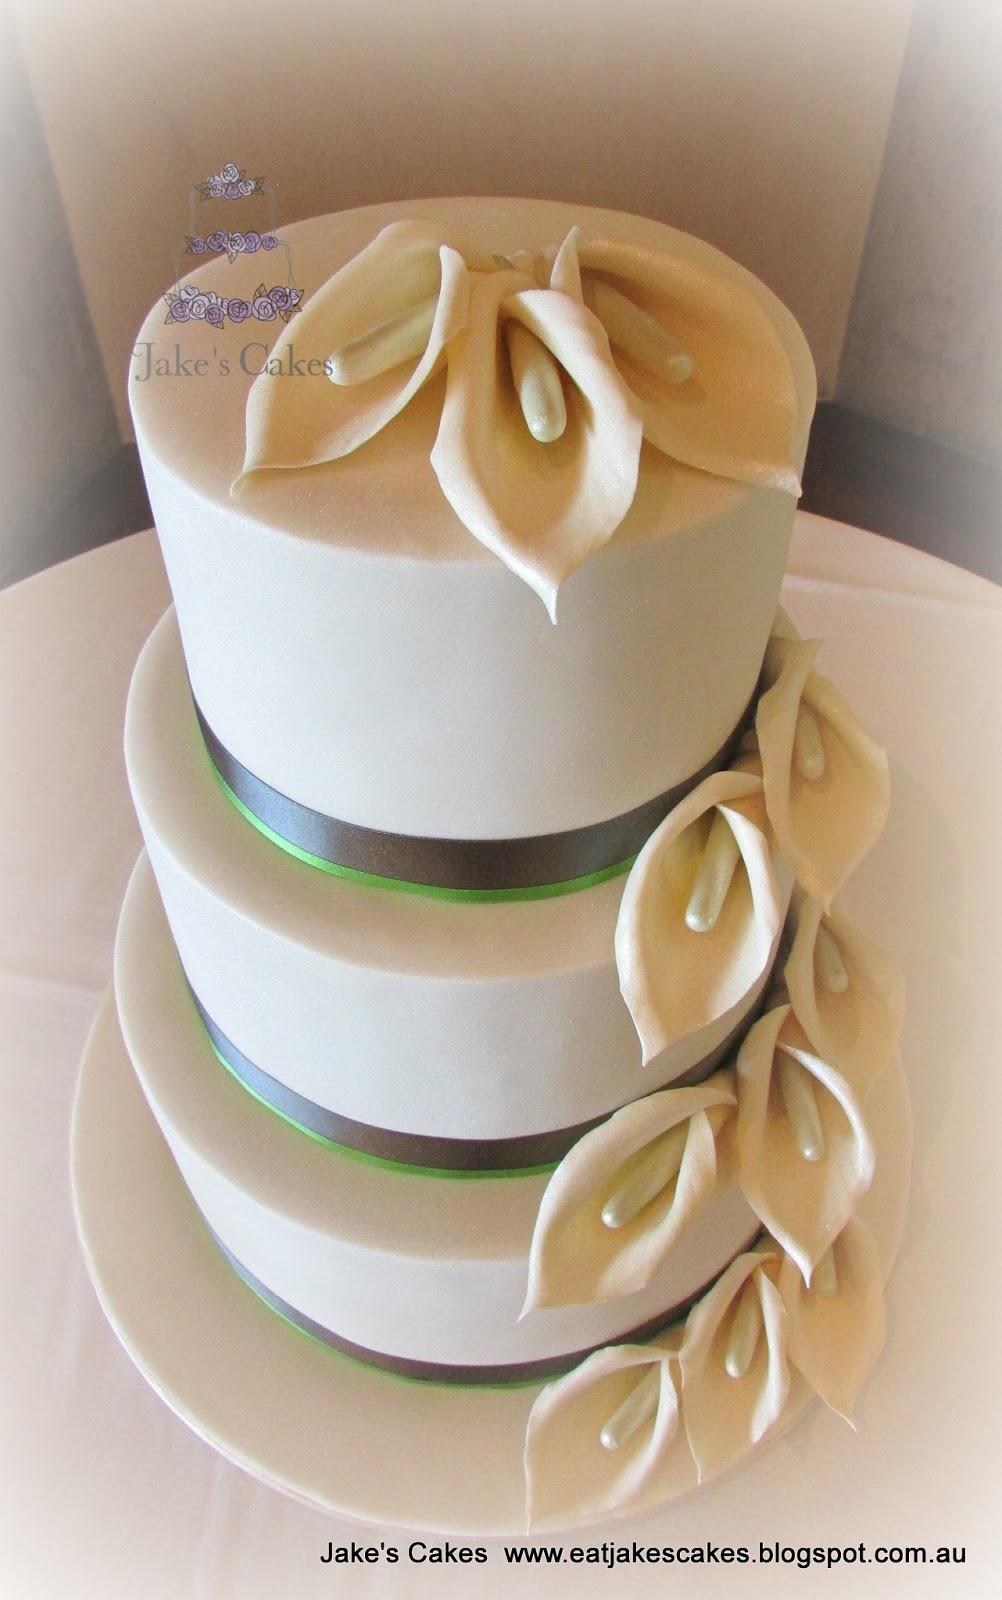 Jakes Cakes Calla Lily Wedding Cake - Calla Lilly Wedding Cake